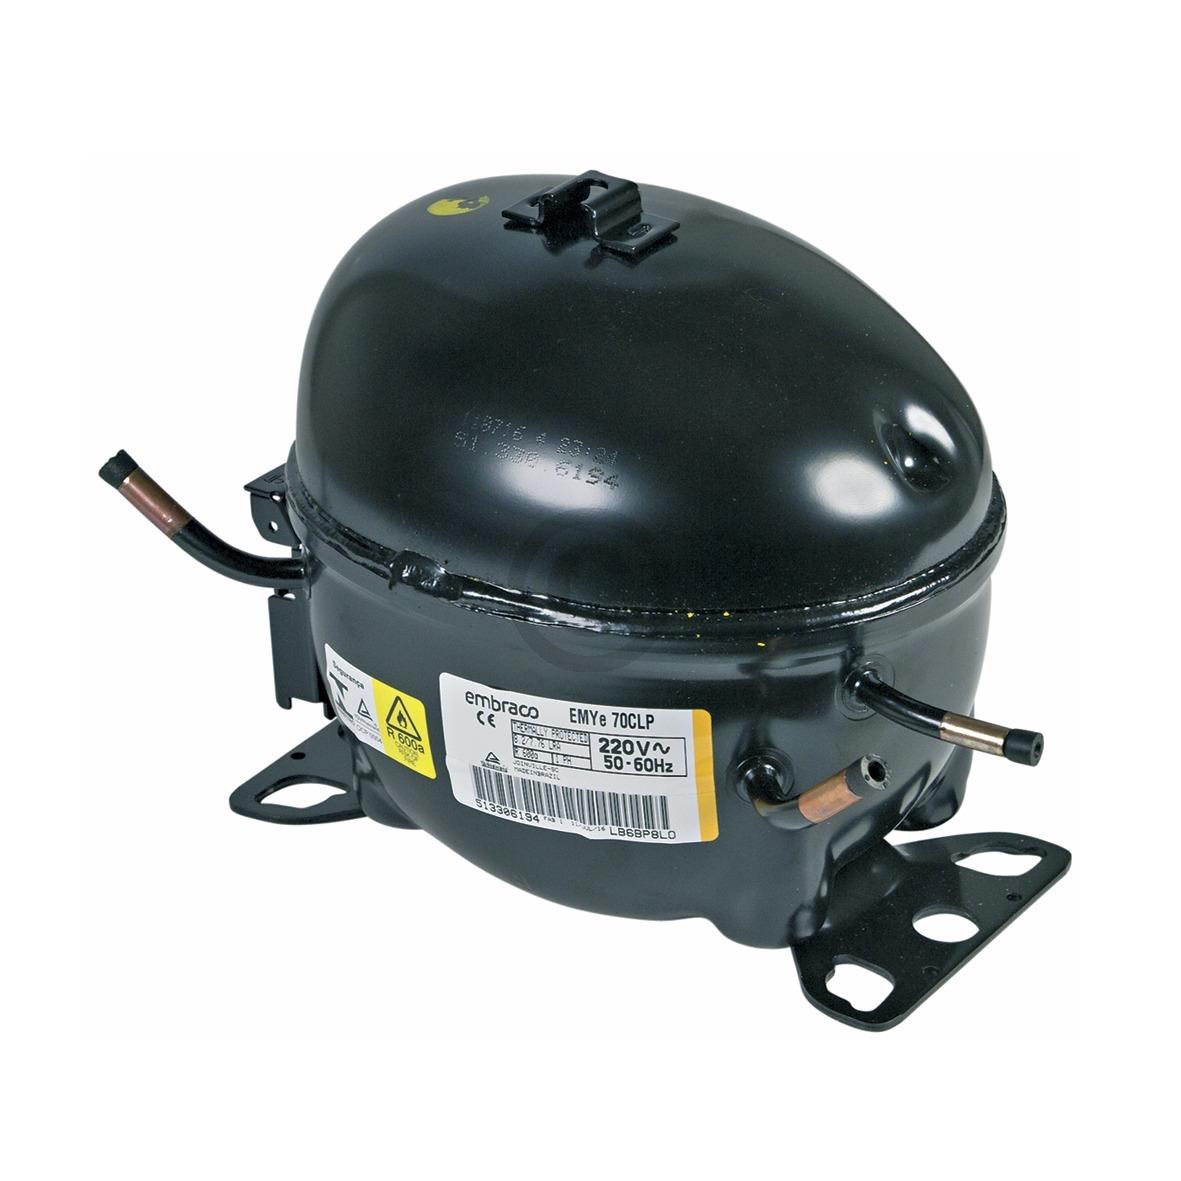 Kompressor für R600A 1/5PS 481236039073 Bauknecht, Whirlpool, Ikea, Liebherr